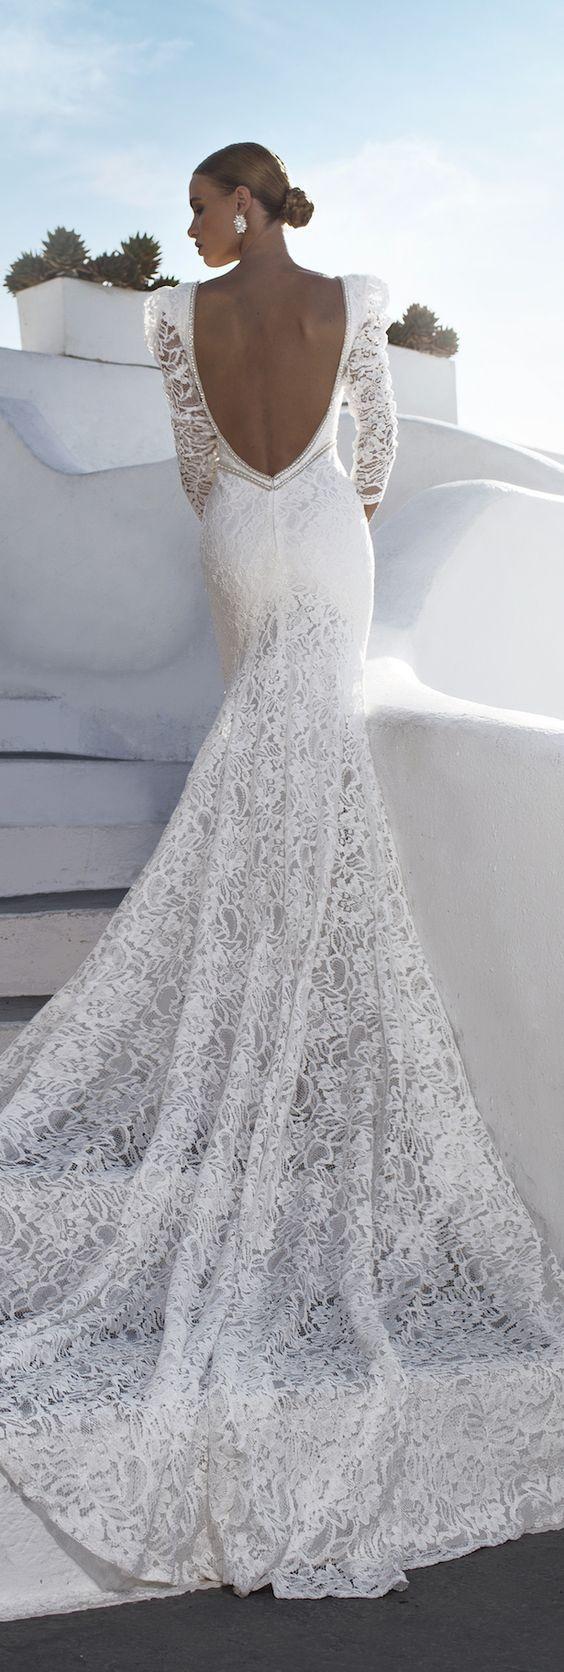 Hochzeit - Ƹ̵̡Ӝ̵̨̄Ʒ Glamorous Wedding Ƹ̵̡Ӝ̵̨̄Ʒ